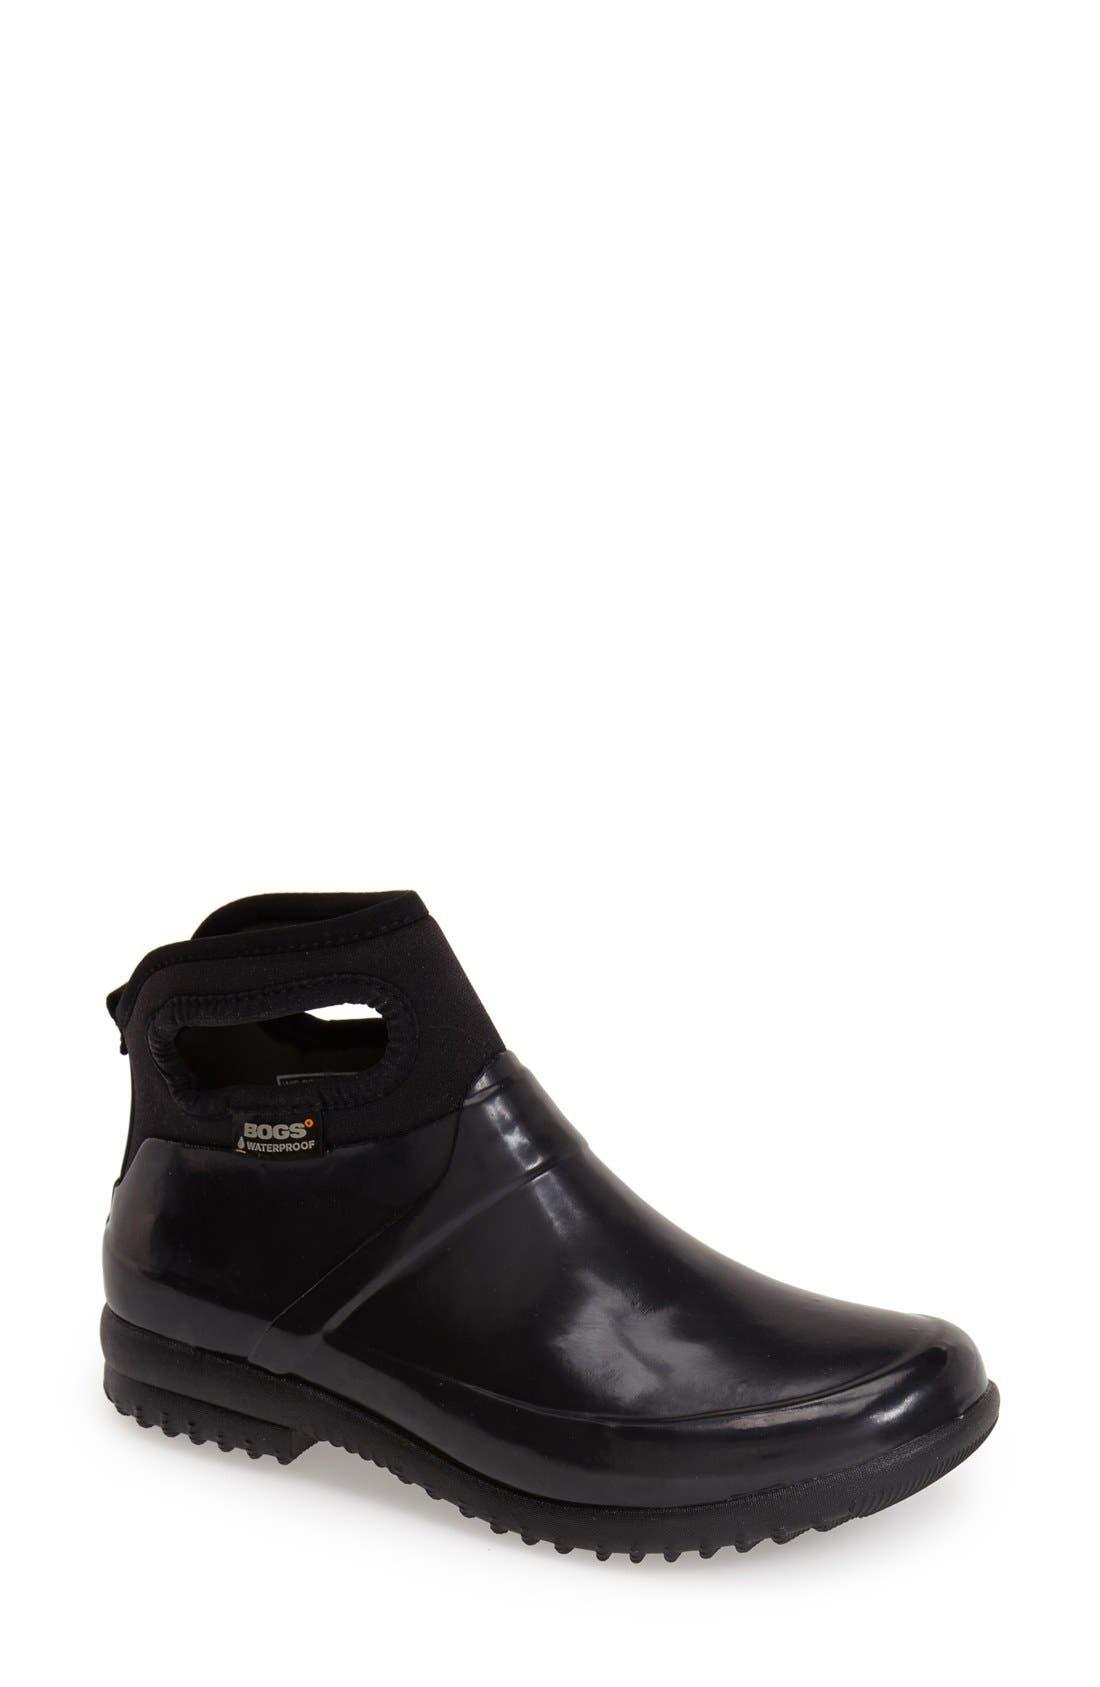 'Seattle' Waterproof Short Boot,                             Main thumbnail 1, color,                             BLACK